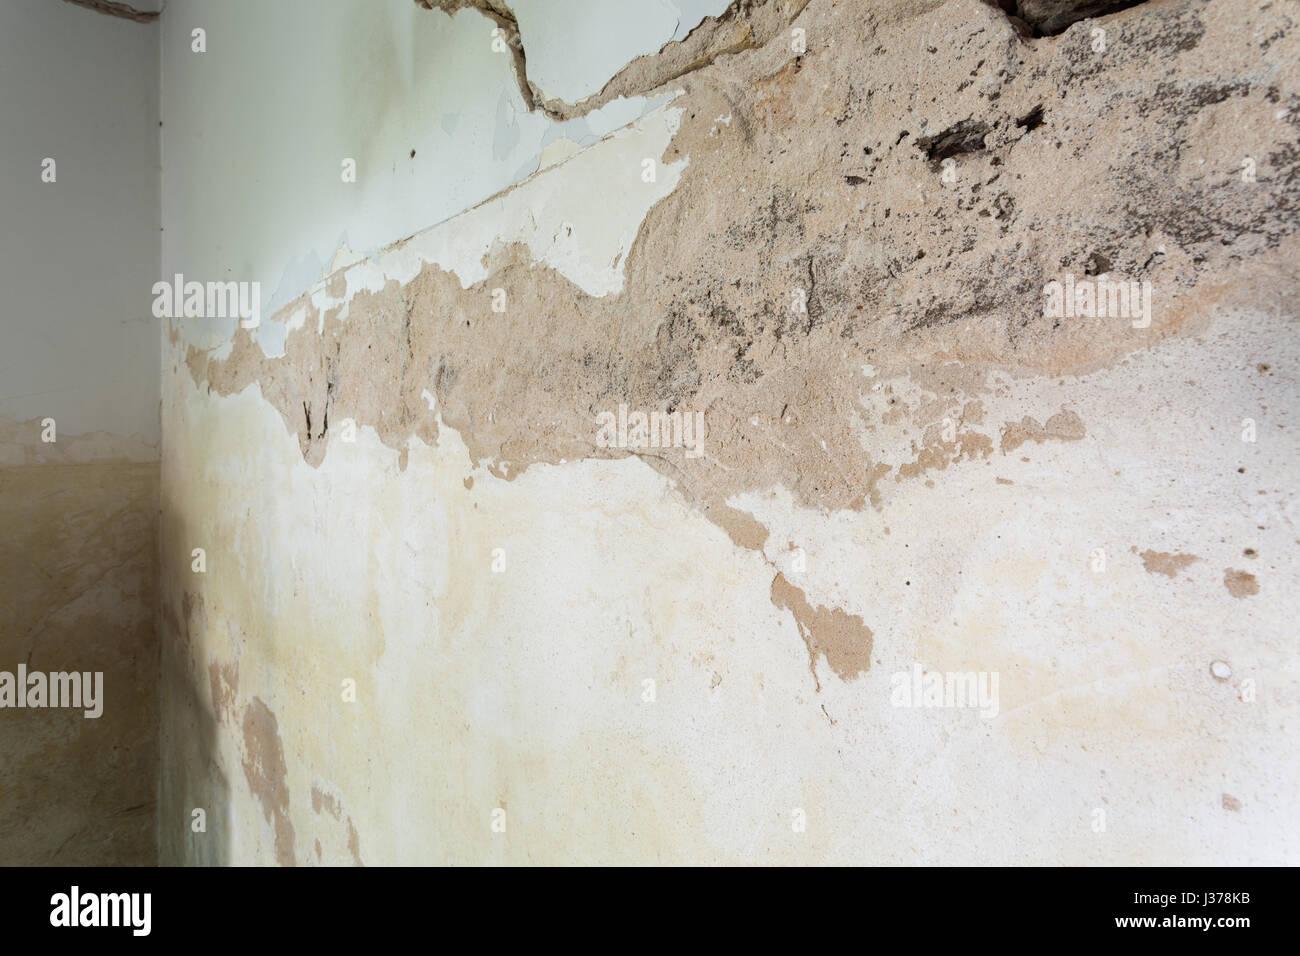 flaking plaster stock photos flaking plaster stock. Black Bedroom Furniture Sets. Home Design Ideas